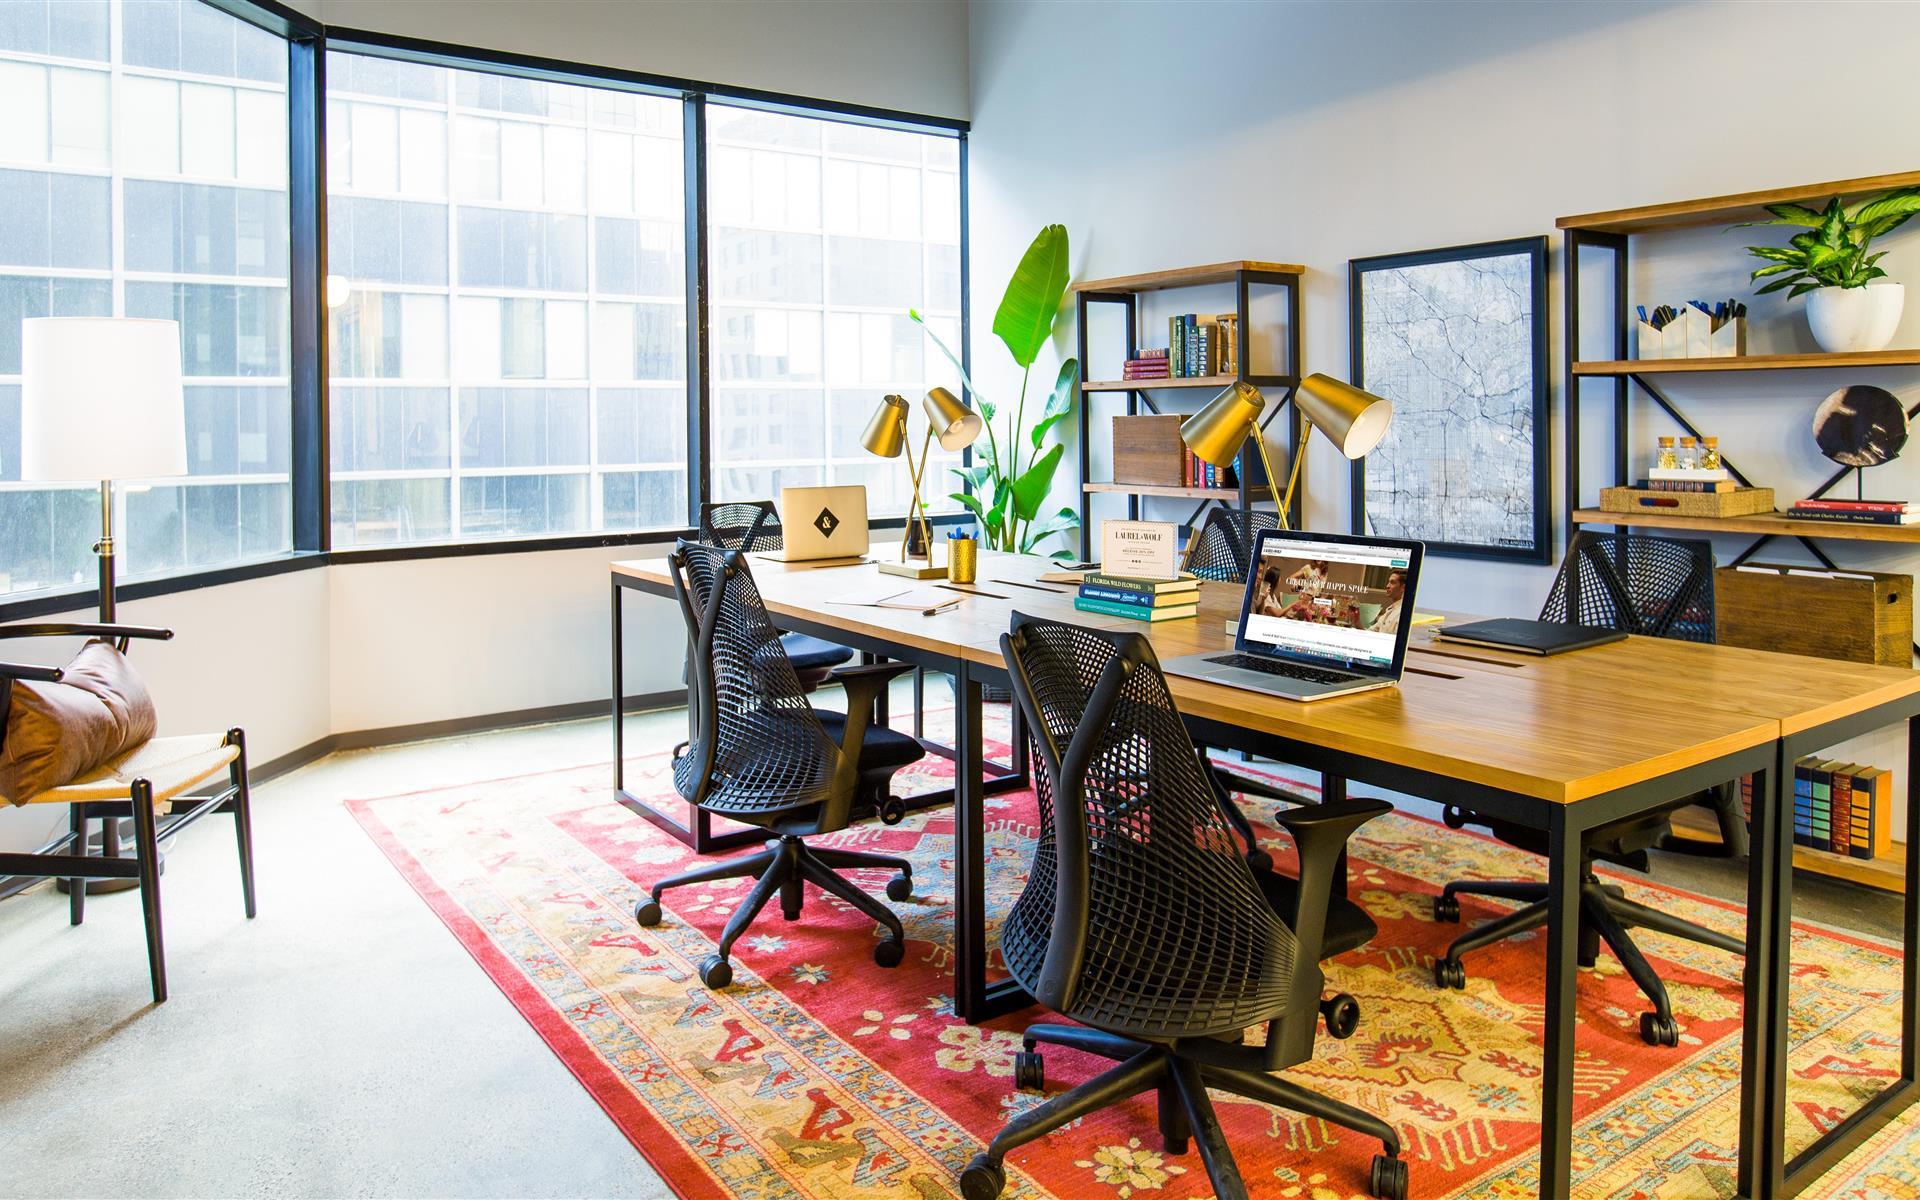 Industrious Atlanta West Midtown - Team Office for 4